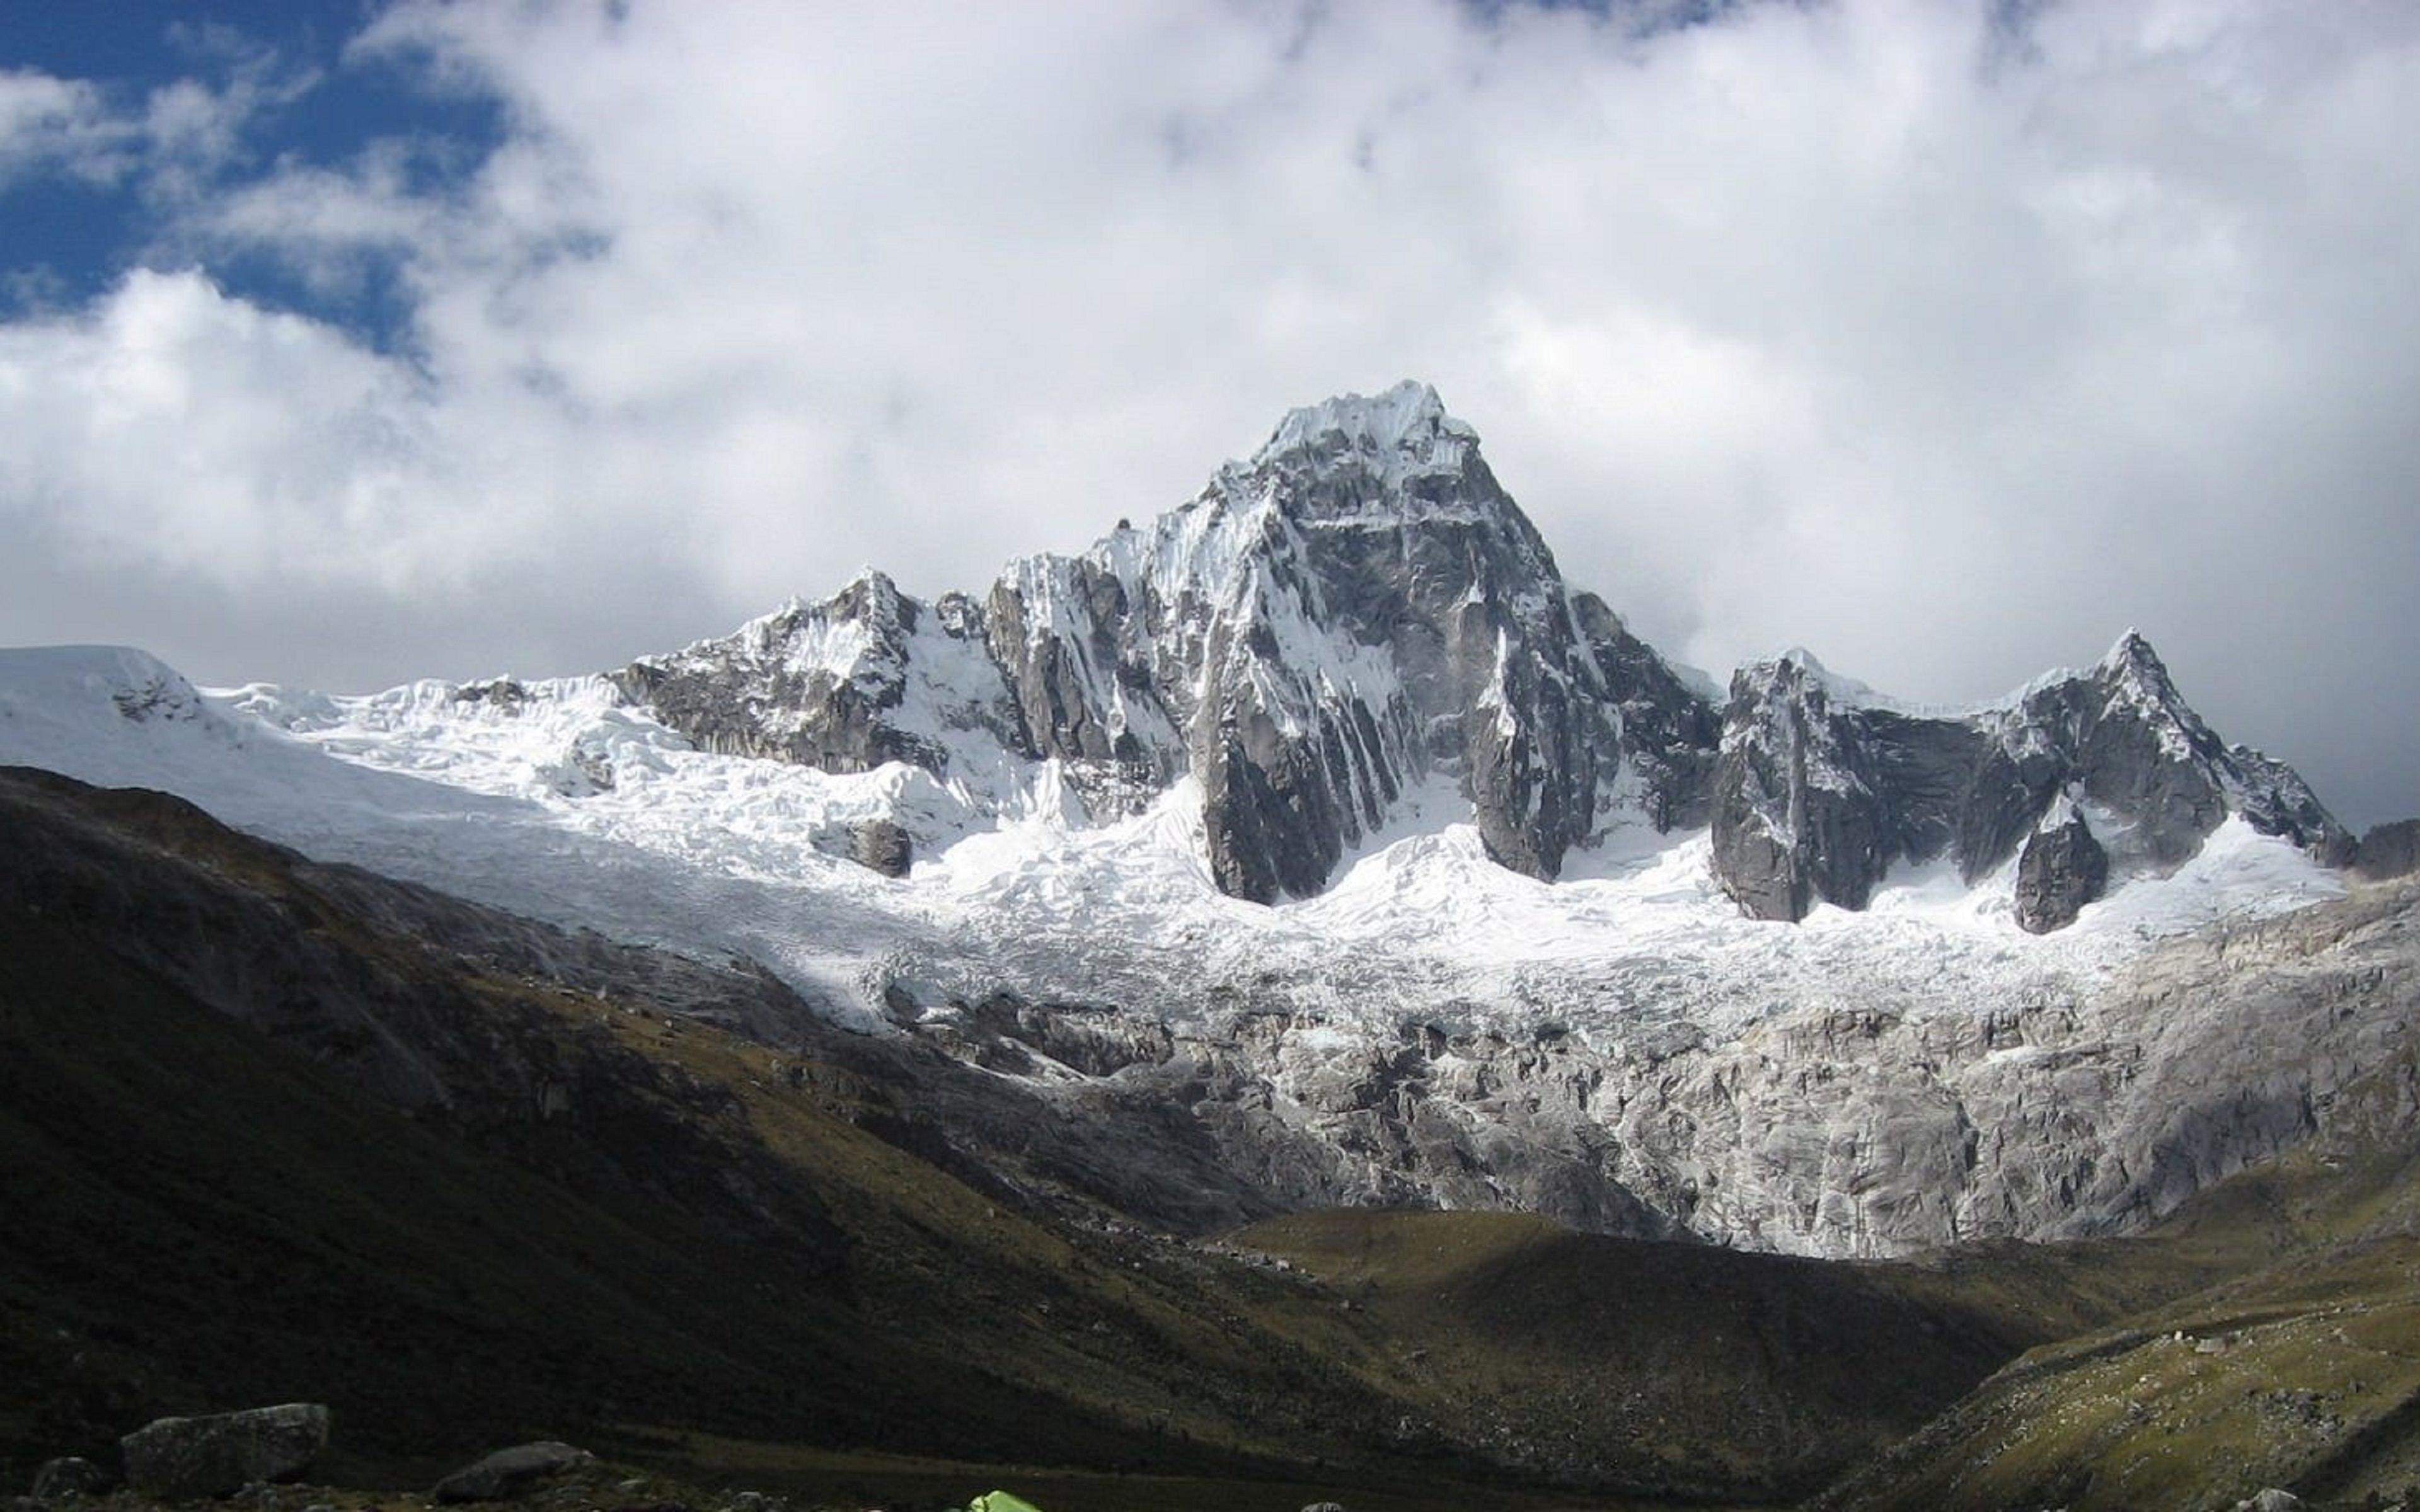 Huaraz, Cordillera Blanca trekking